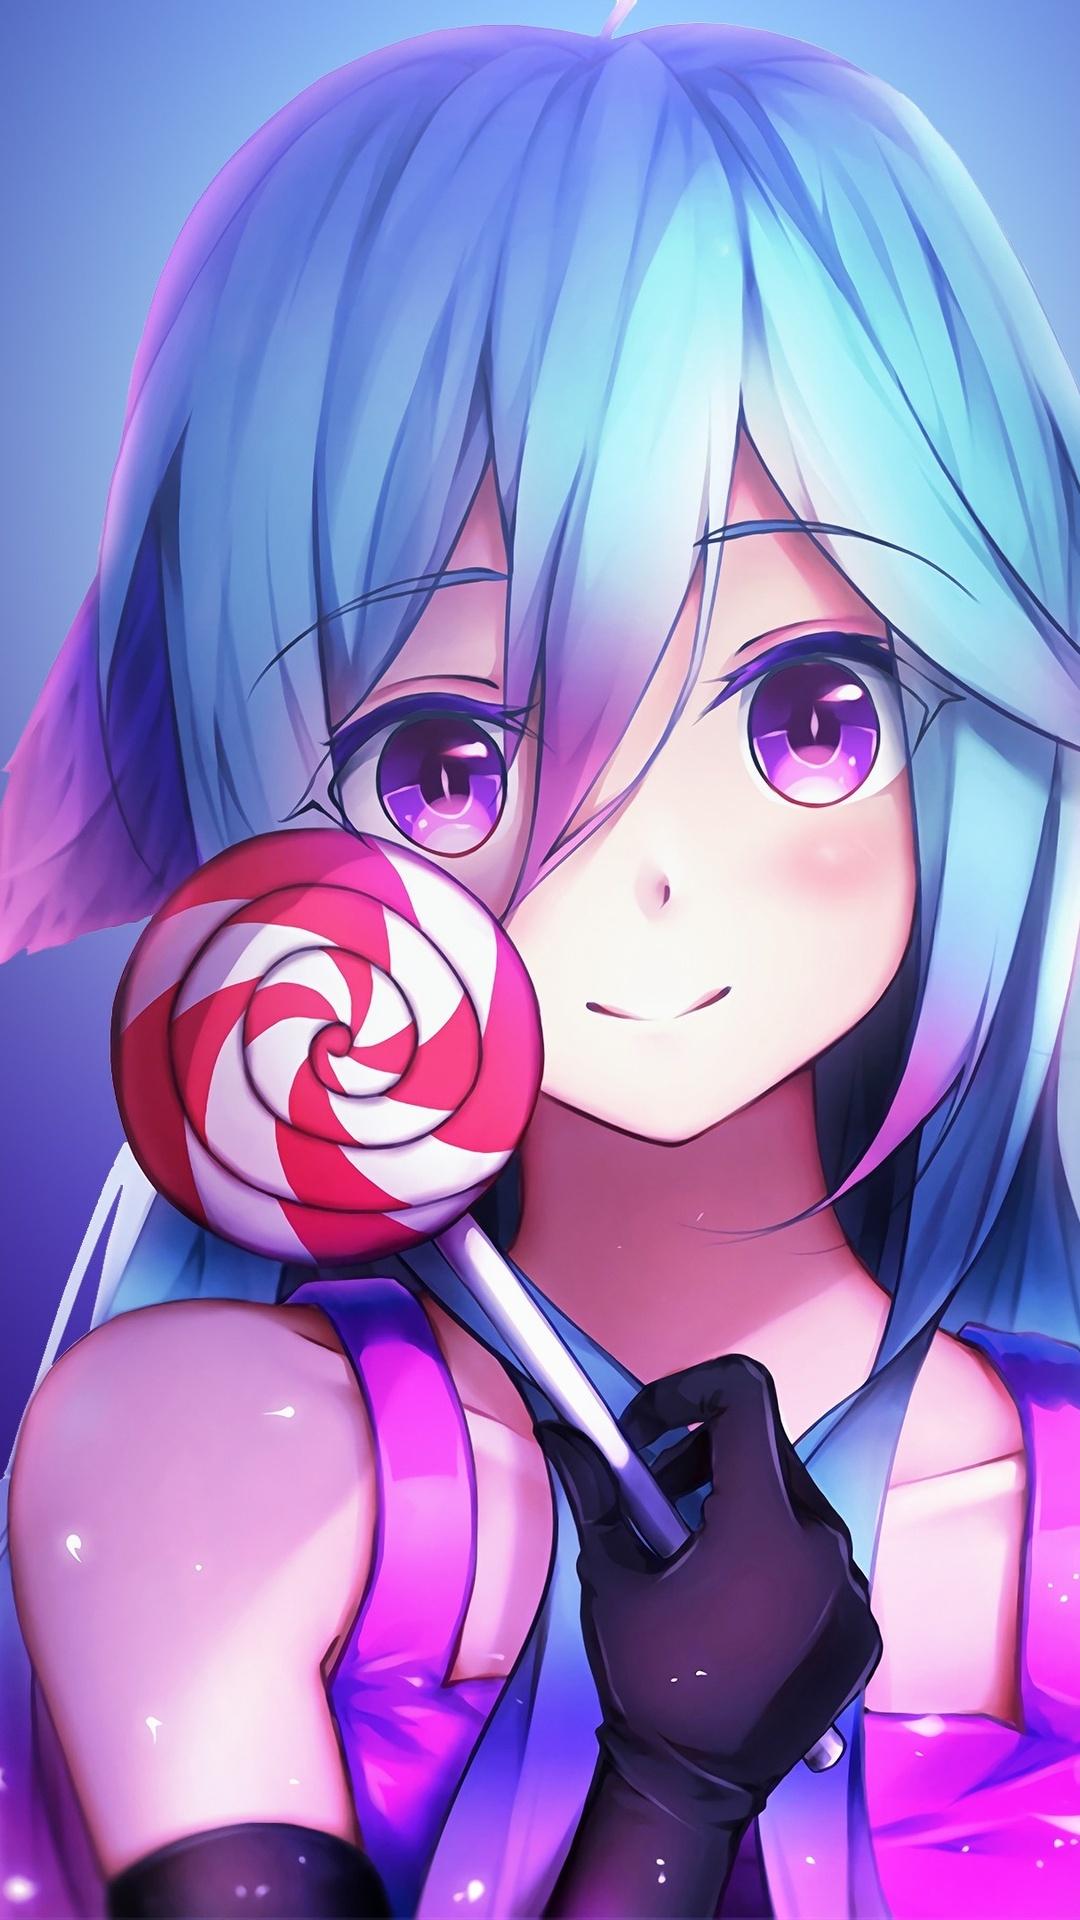 1080x1920 Anime Girl Cute Rainbows And Lolipop Iphone 7,6s ...